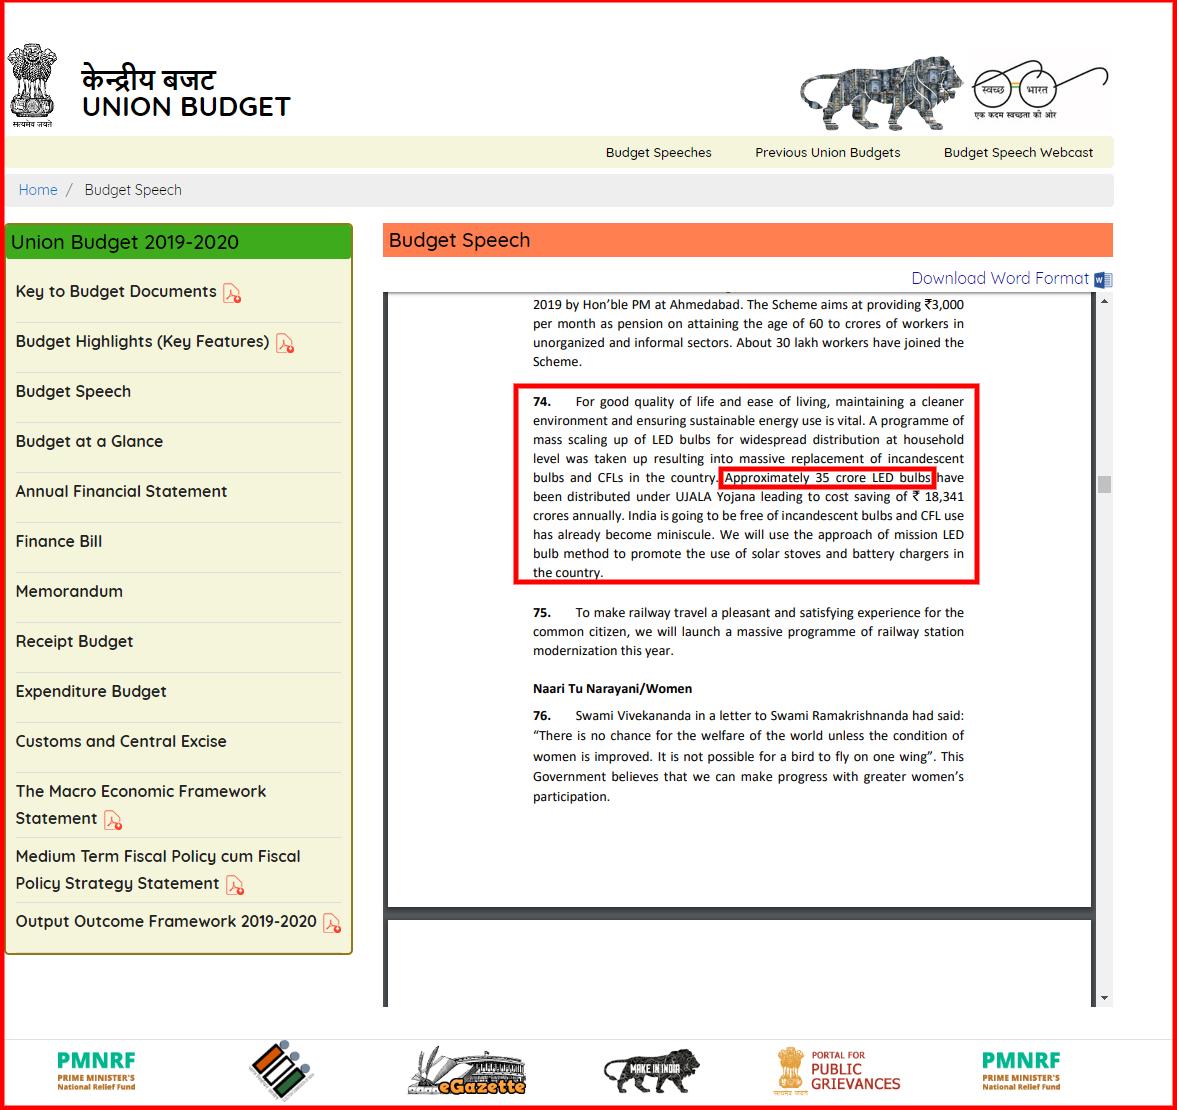 screenshot-www.indiabudget.gov.in-2019.07.06-21-14-56.png